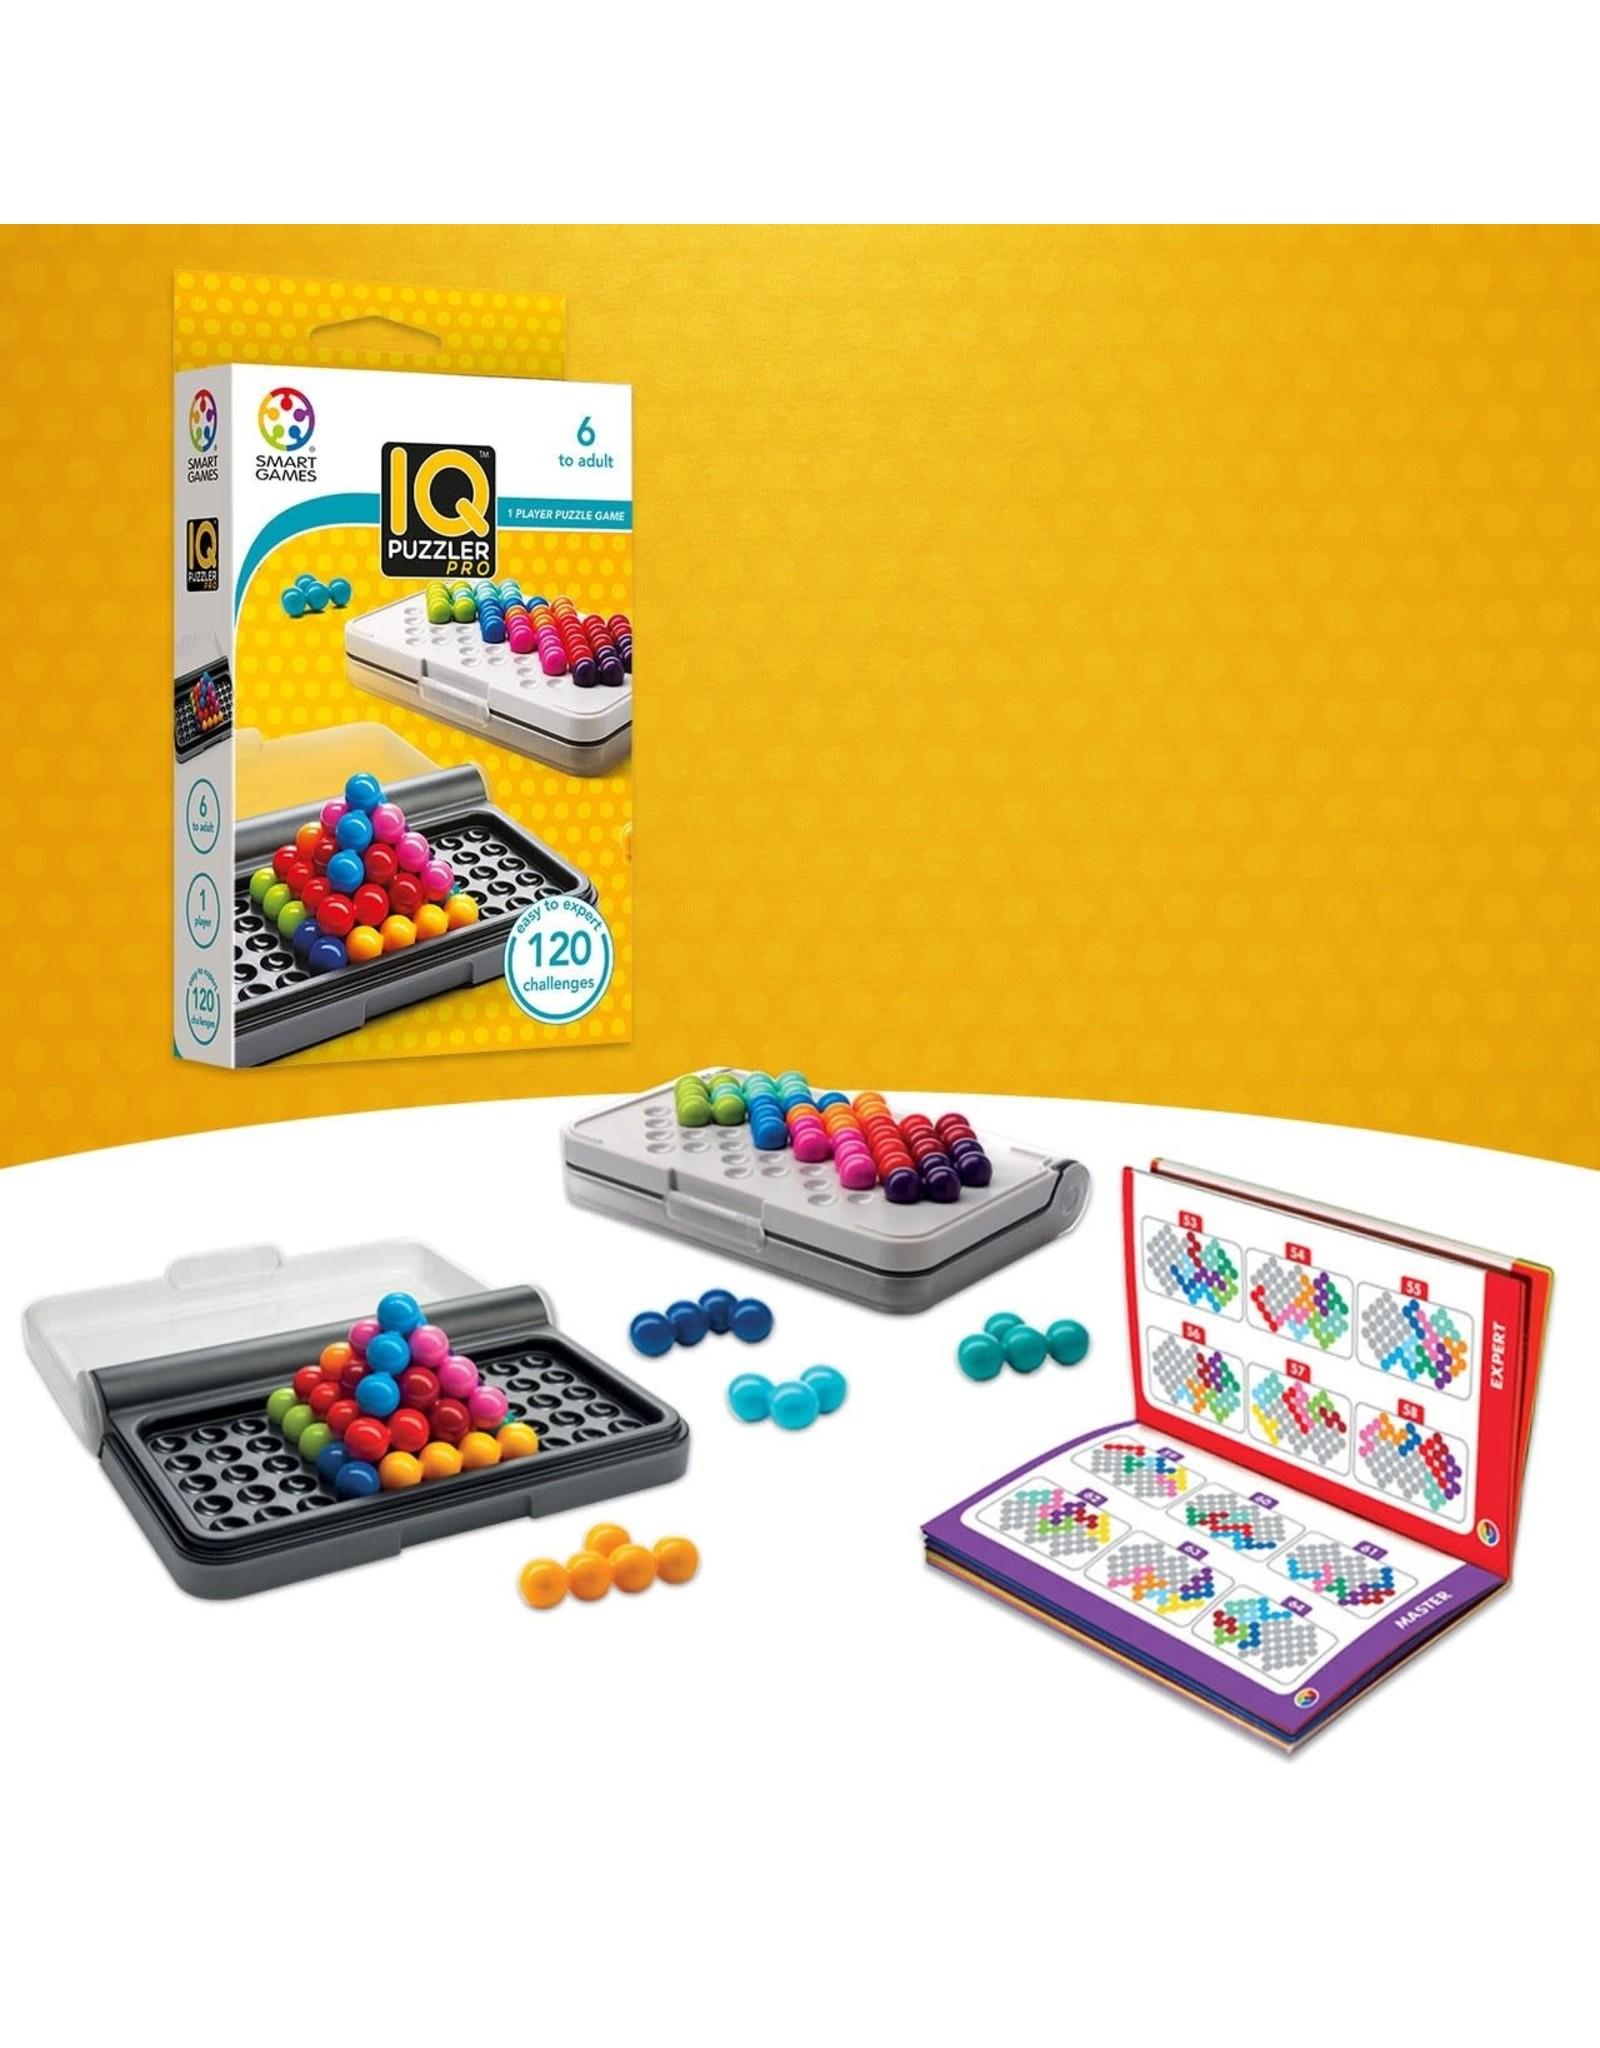 Smart Games IQ - Puzzler Pro